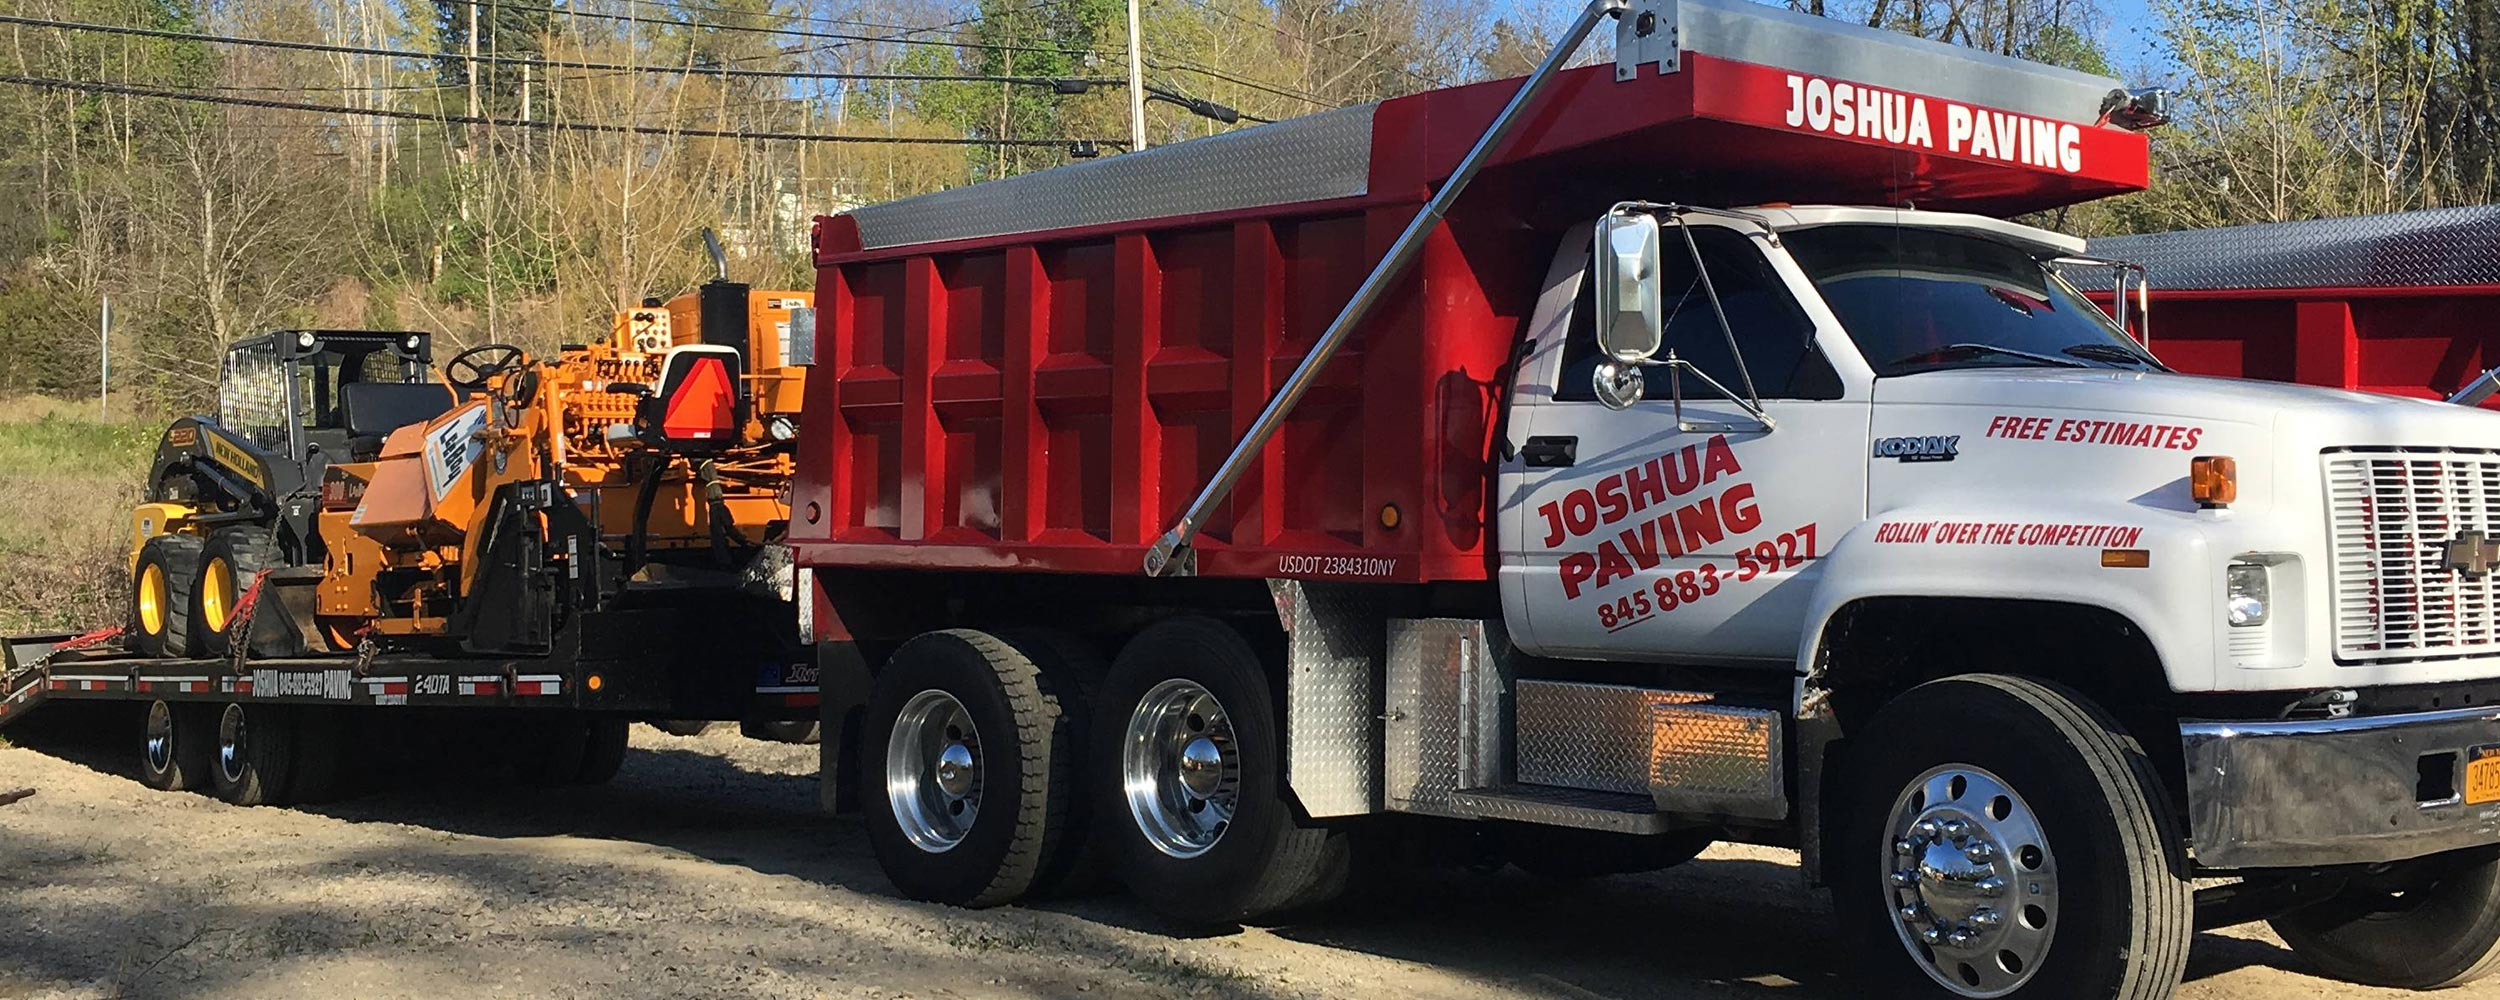 Joshua Paving Truck